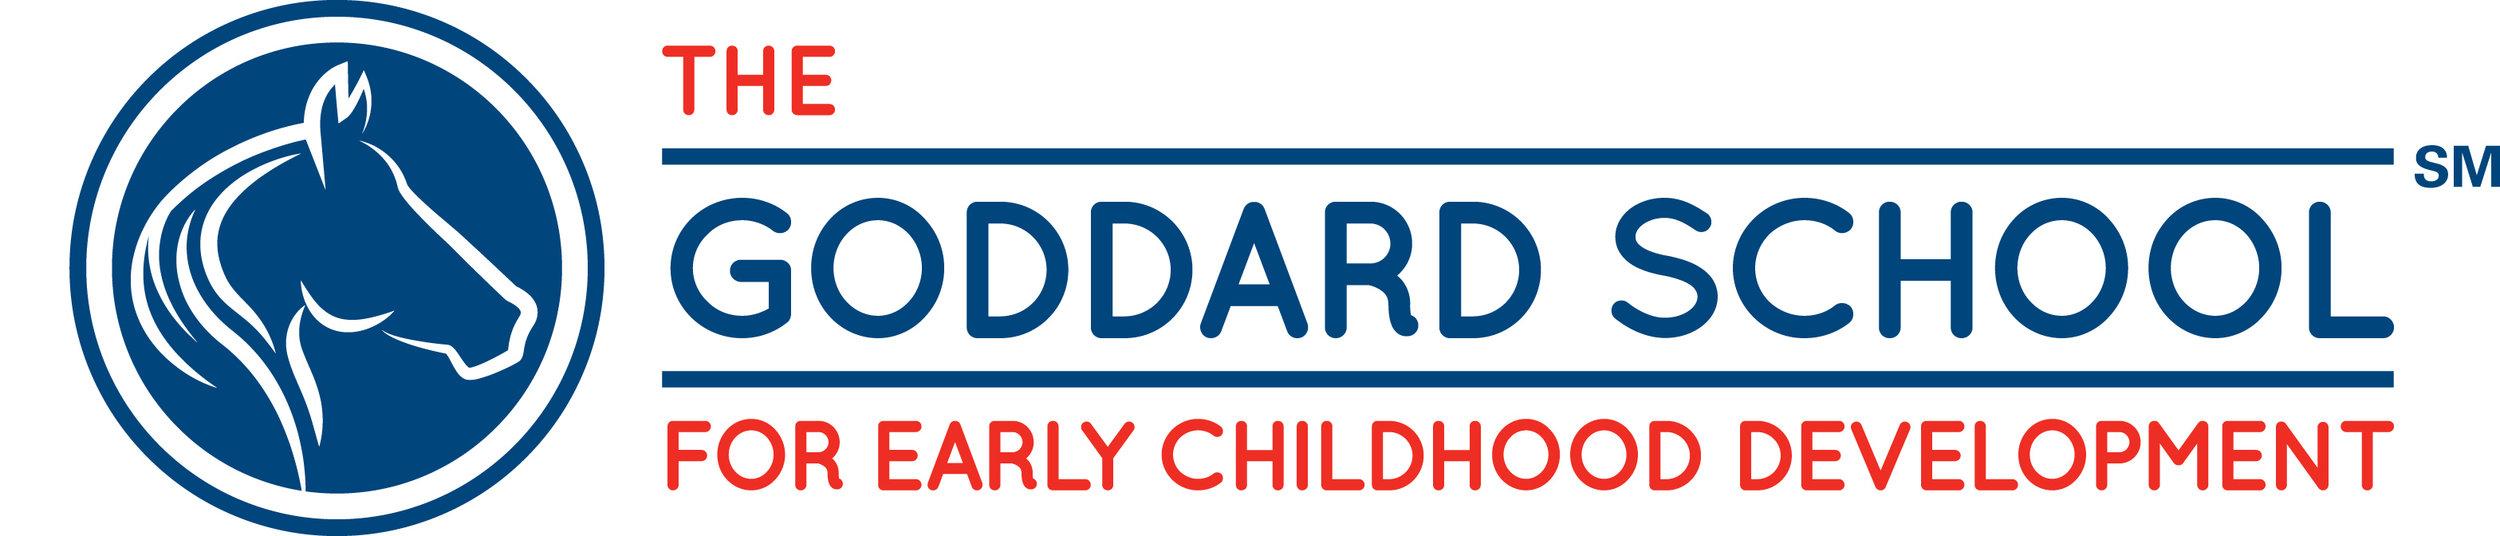 Goddard-Logo-Full-Color.jpg